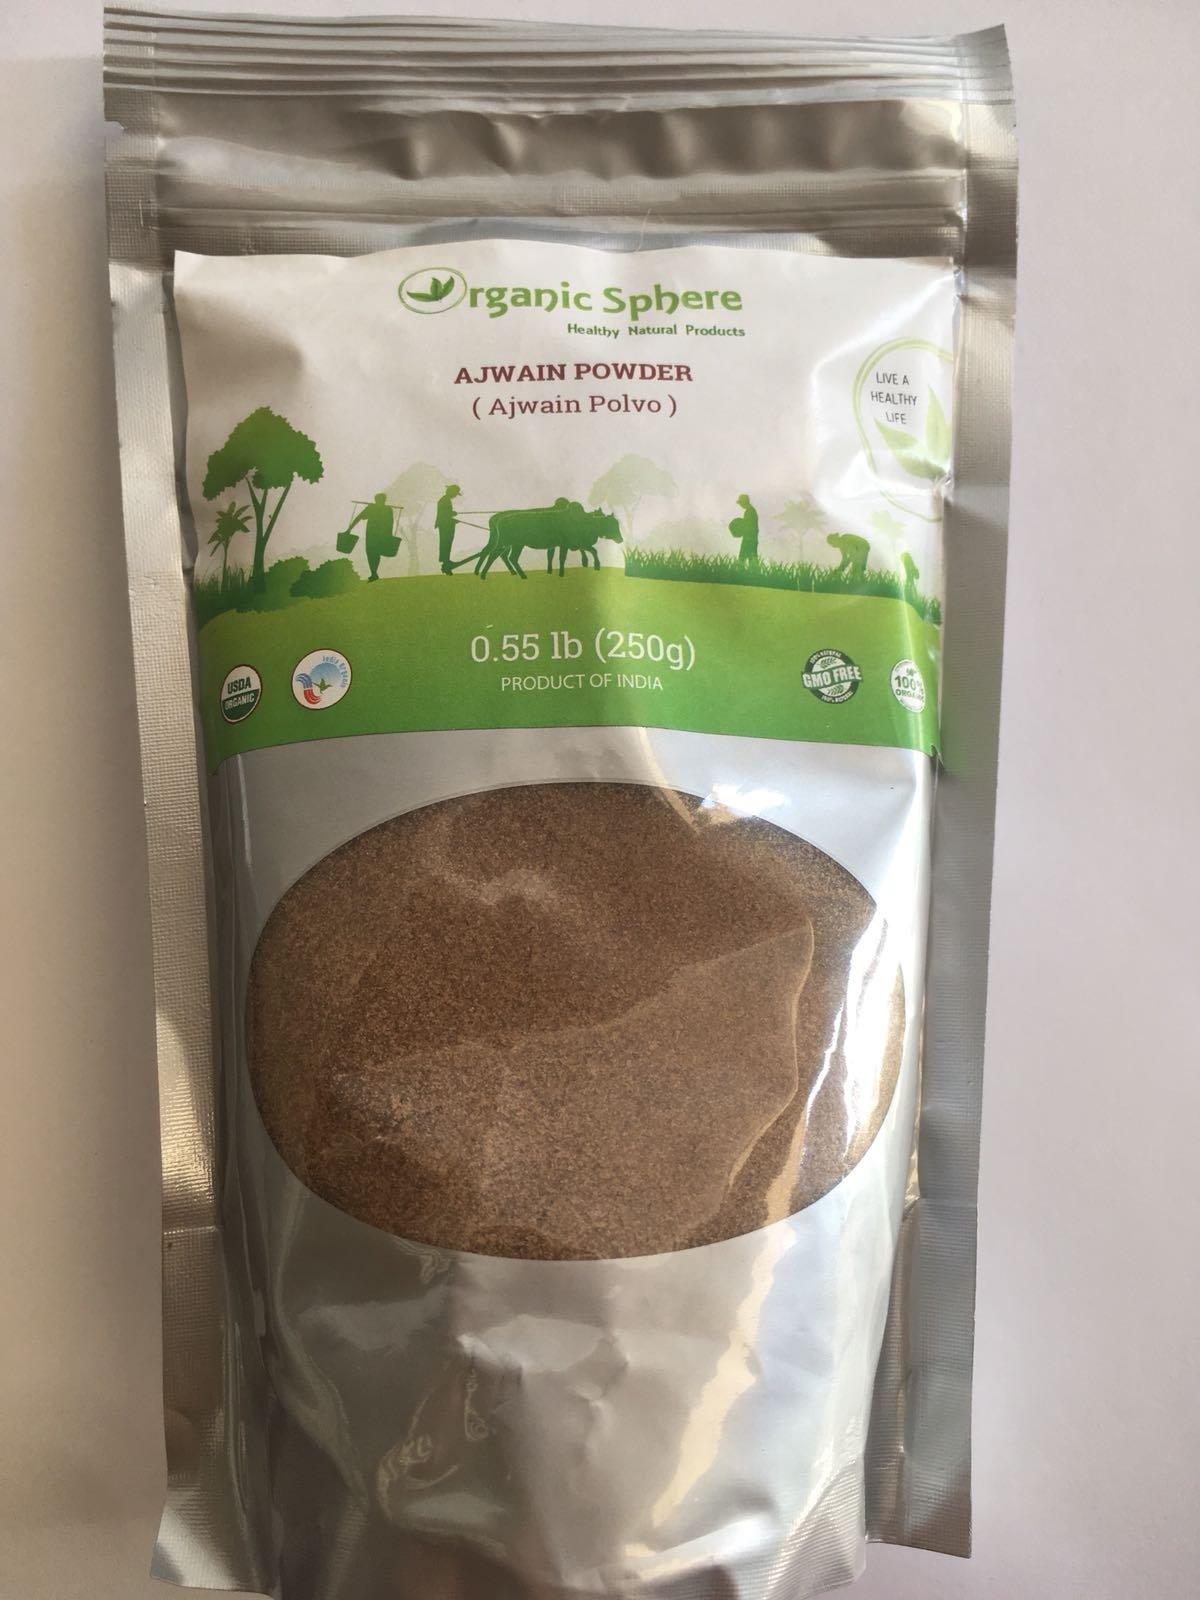 Ajwain Seeds - USDA Certified Organic - EU Organic - Adulteration Free - Sodium Free - 250 Grams - Organic Sphere